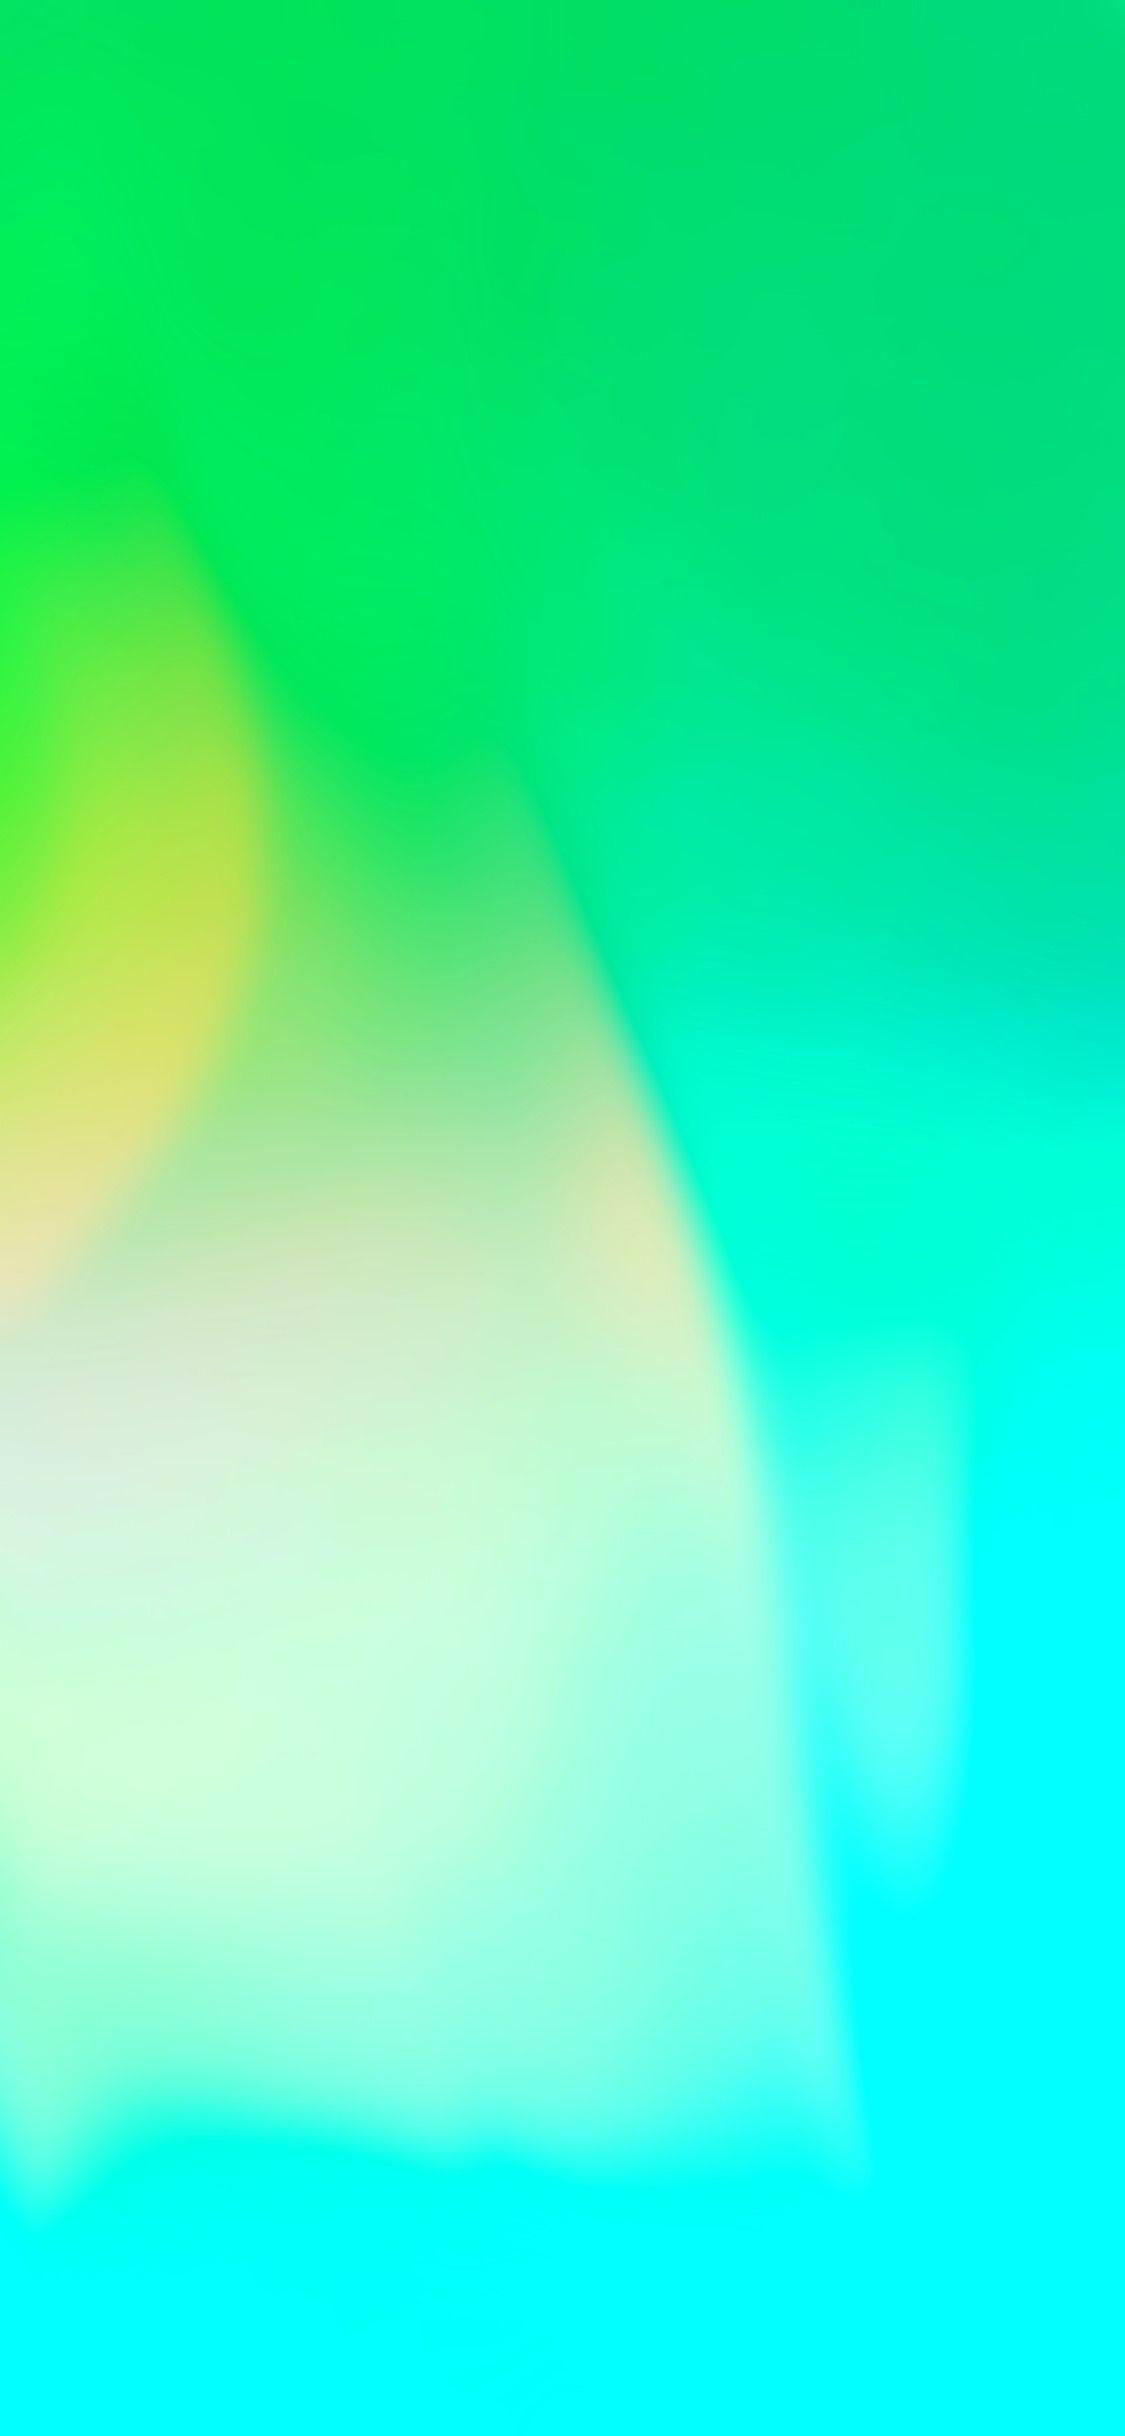 Res: 1125x2436, iOS 11, iPhone X, green, aqua, clean, simple, abstract,